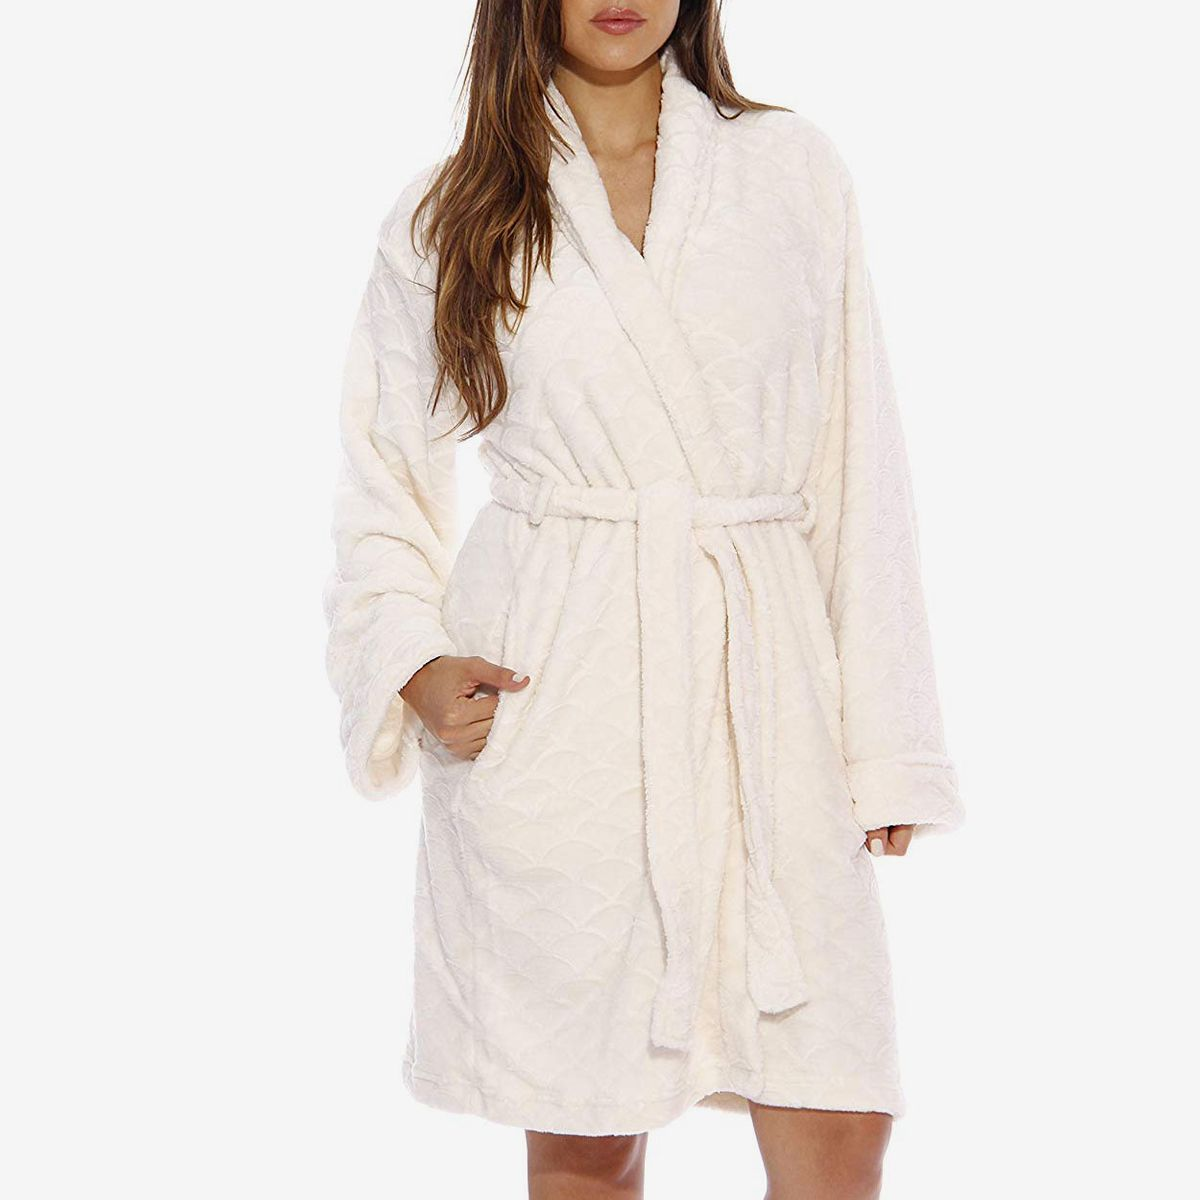 15 Best Bathrobes For Women 2020